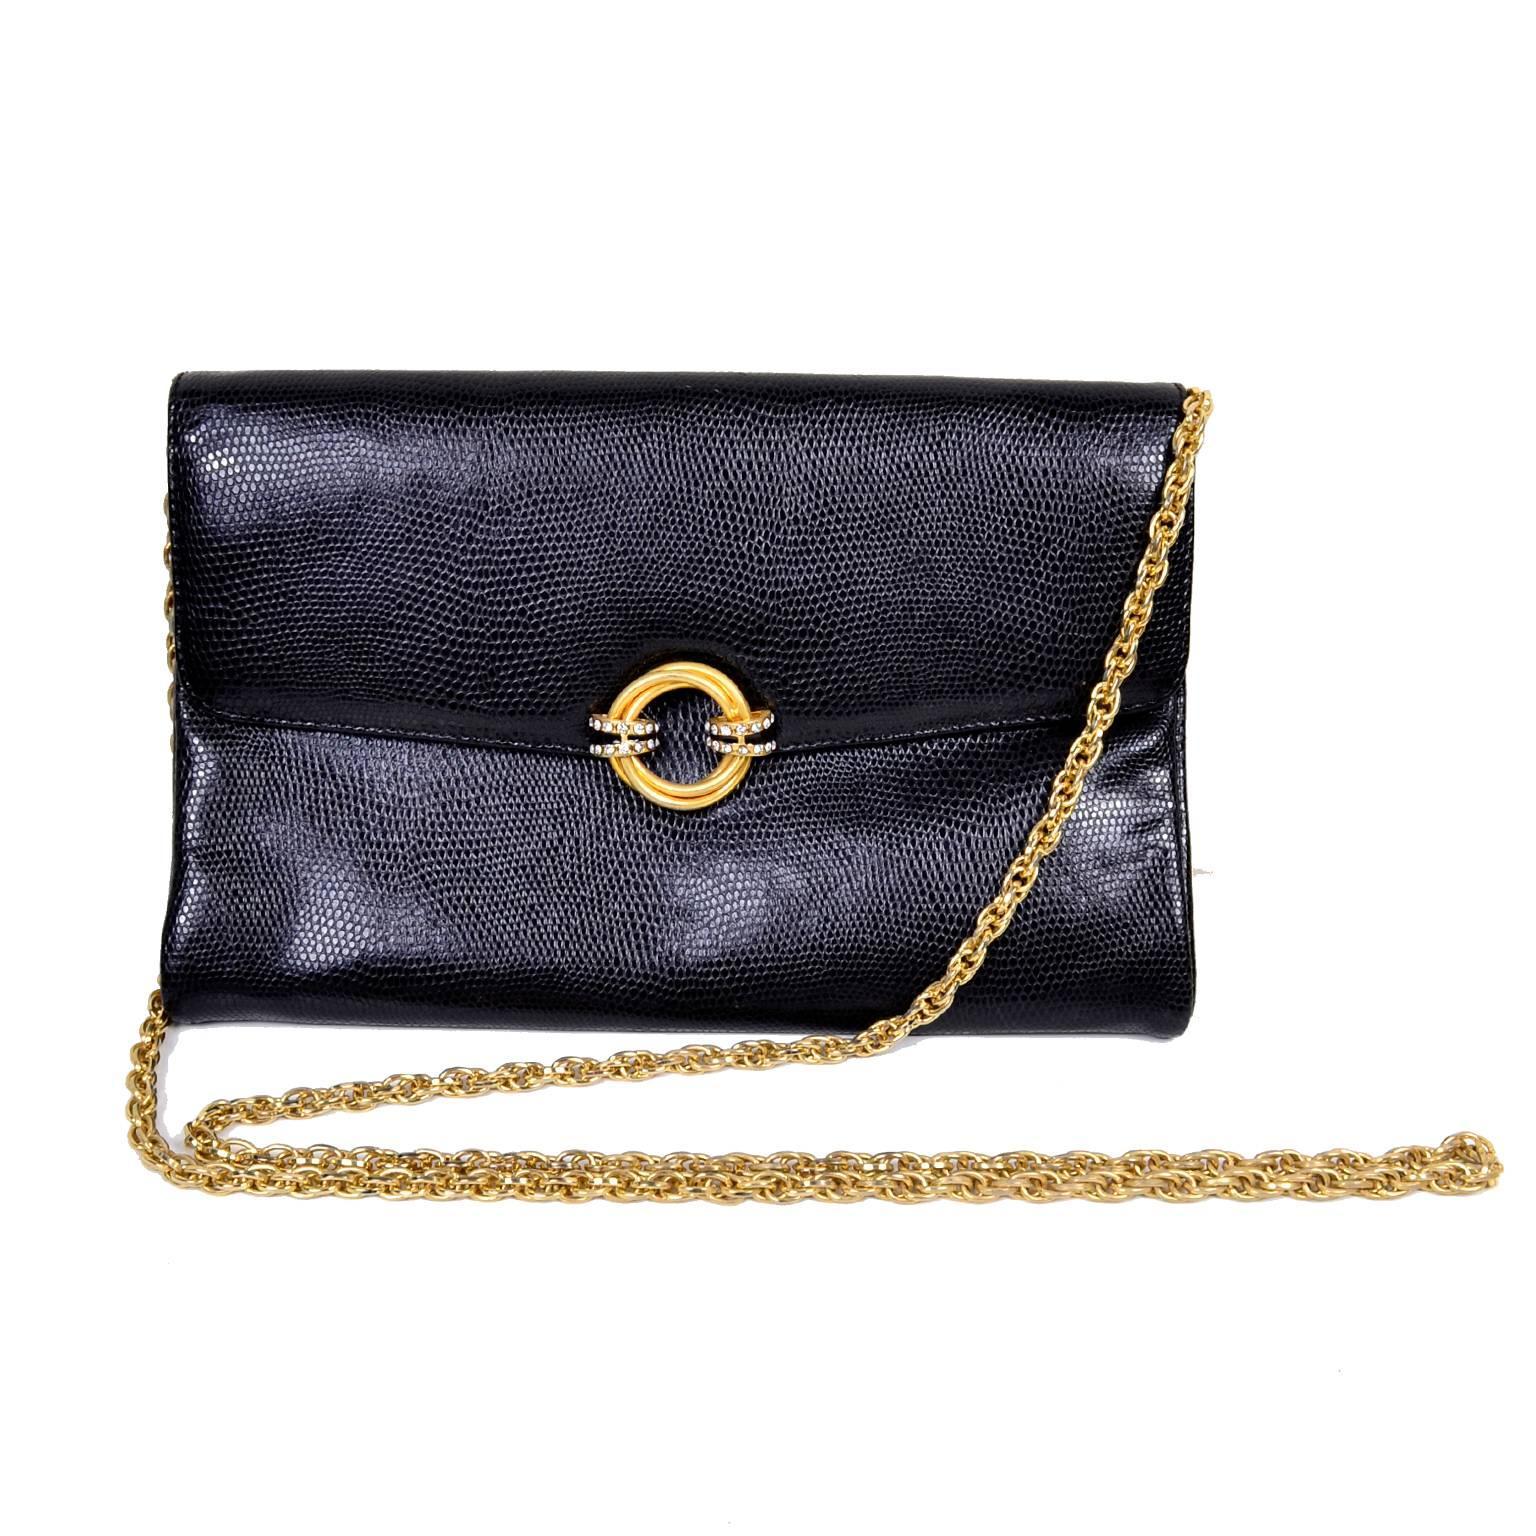 Rodo Italy Vintage Reptile Embossed Black Leather Handbag W/ Rhinestone Clasp HDOQ3i